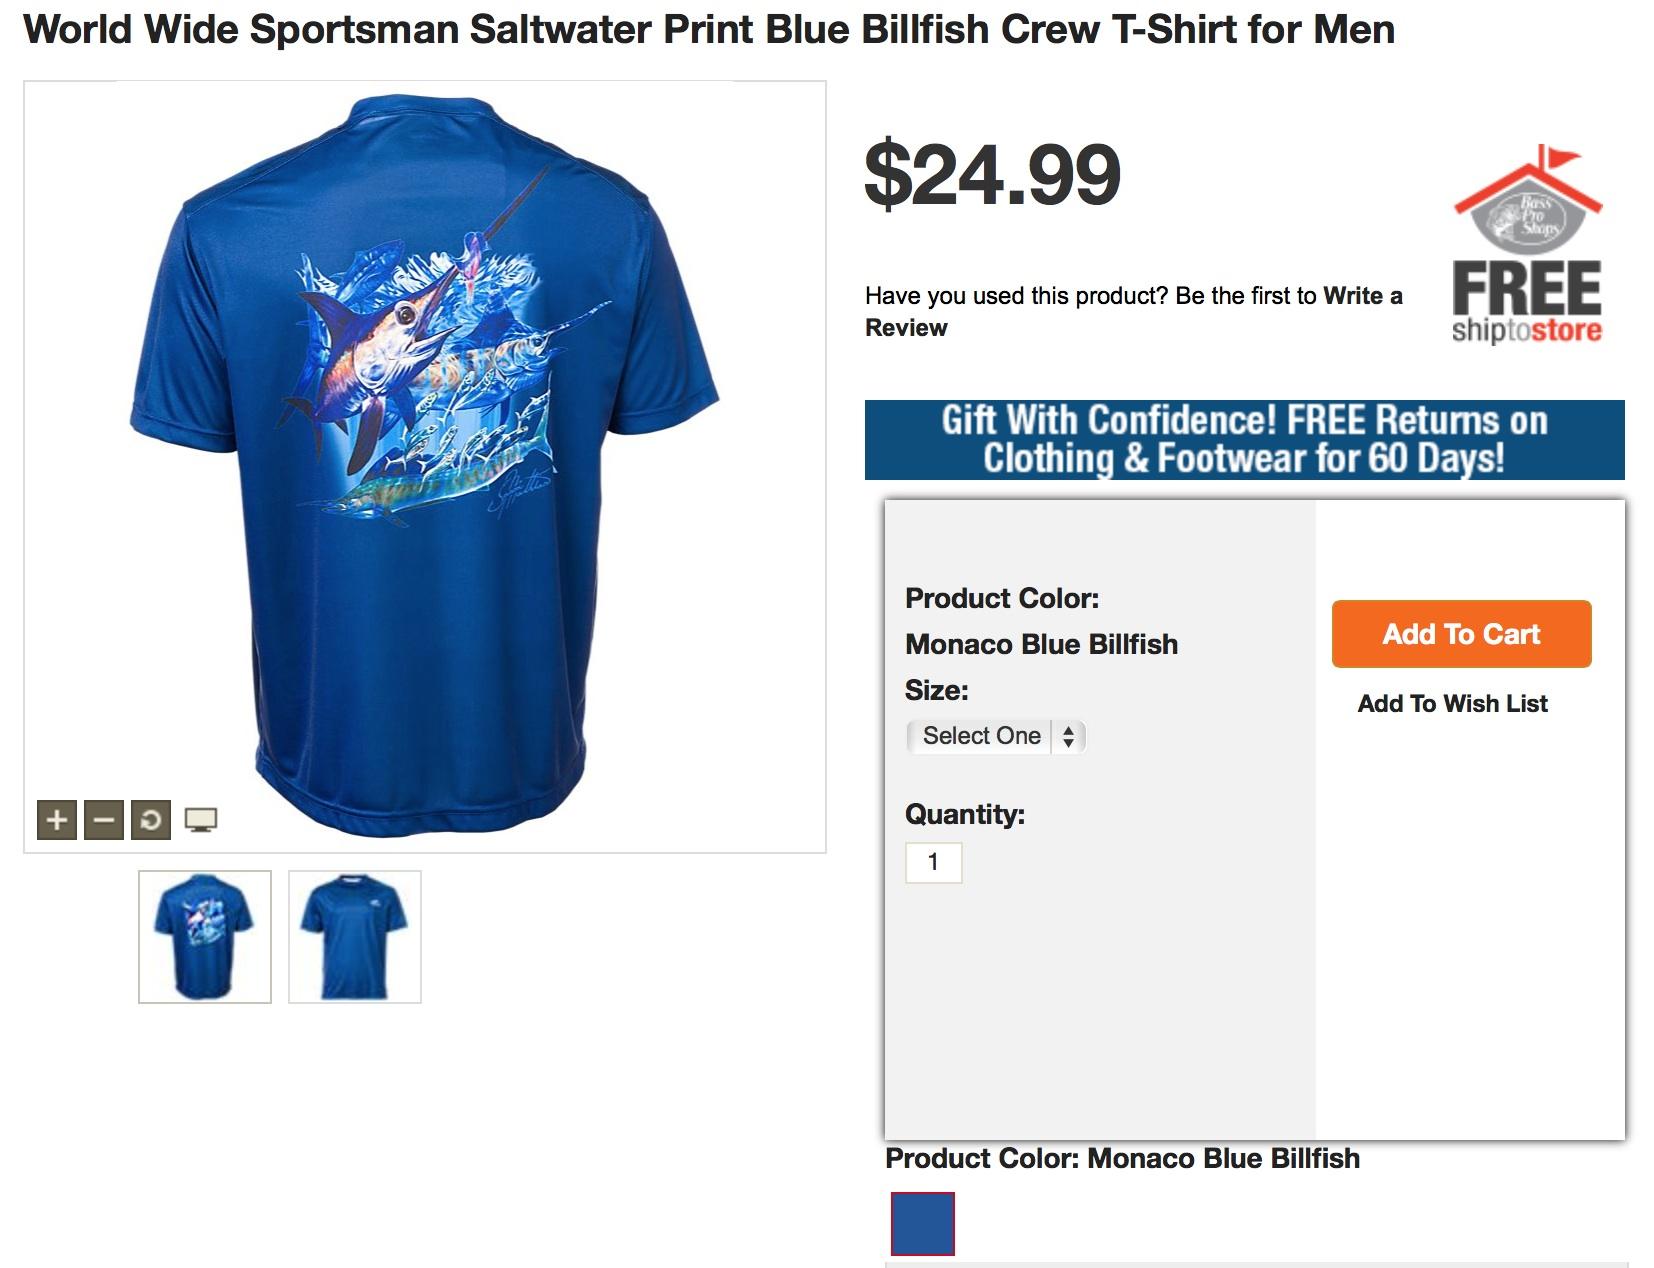 swordfish-world-wide-sportsman-shirt-jason-mathias.jpg